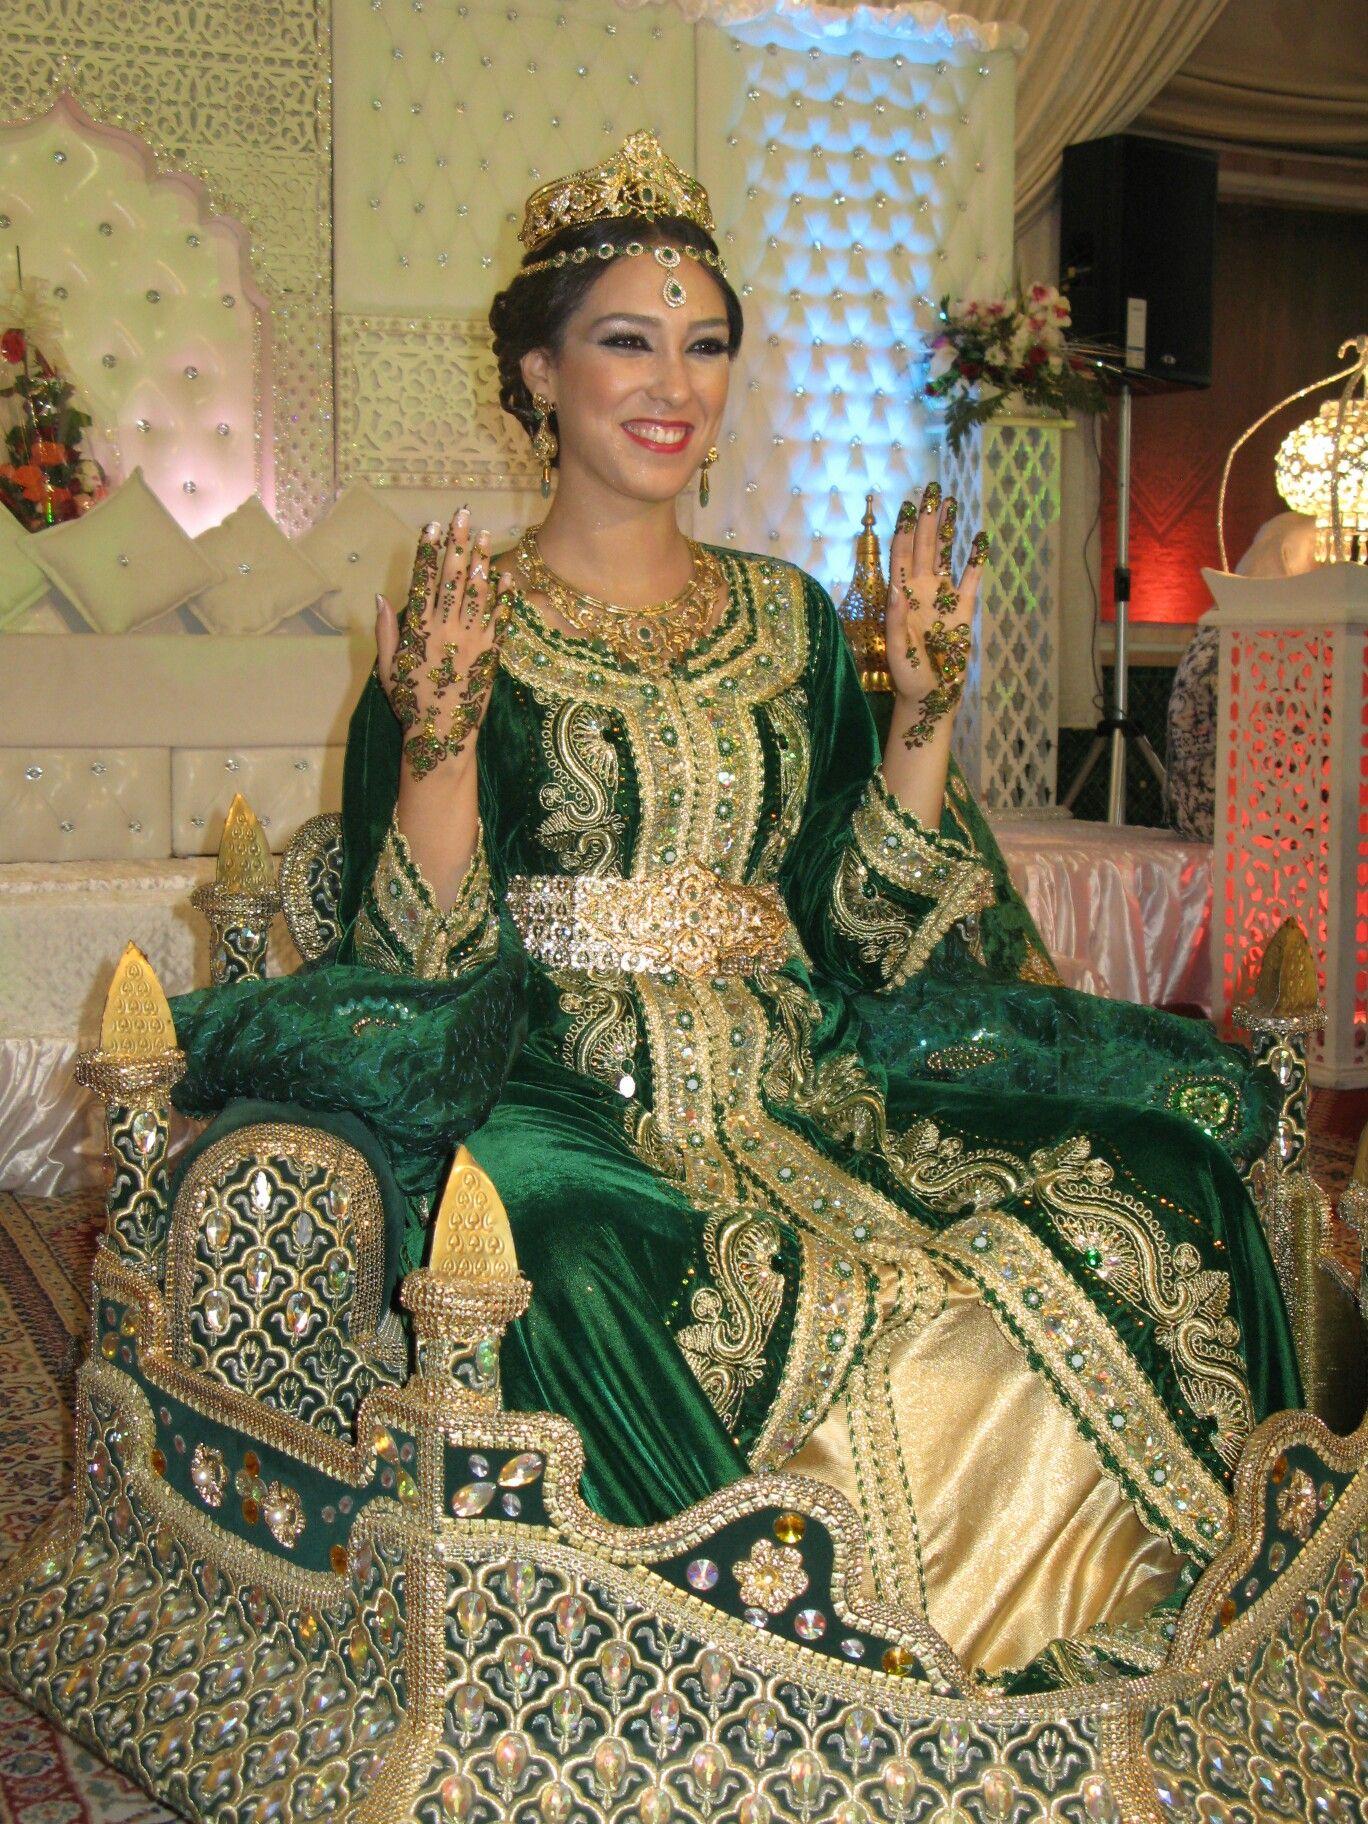 Morocco | Beautiful Arabian women on het wedding day wearing ...